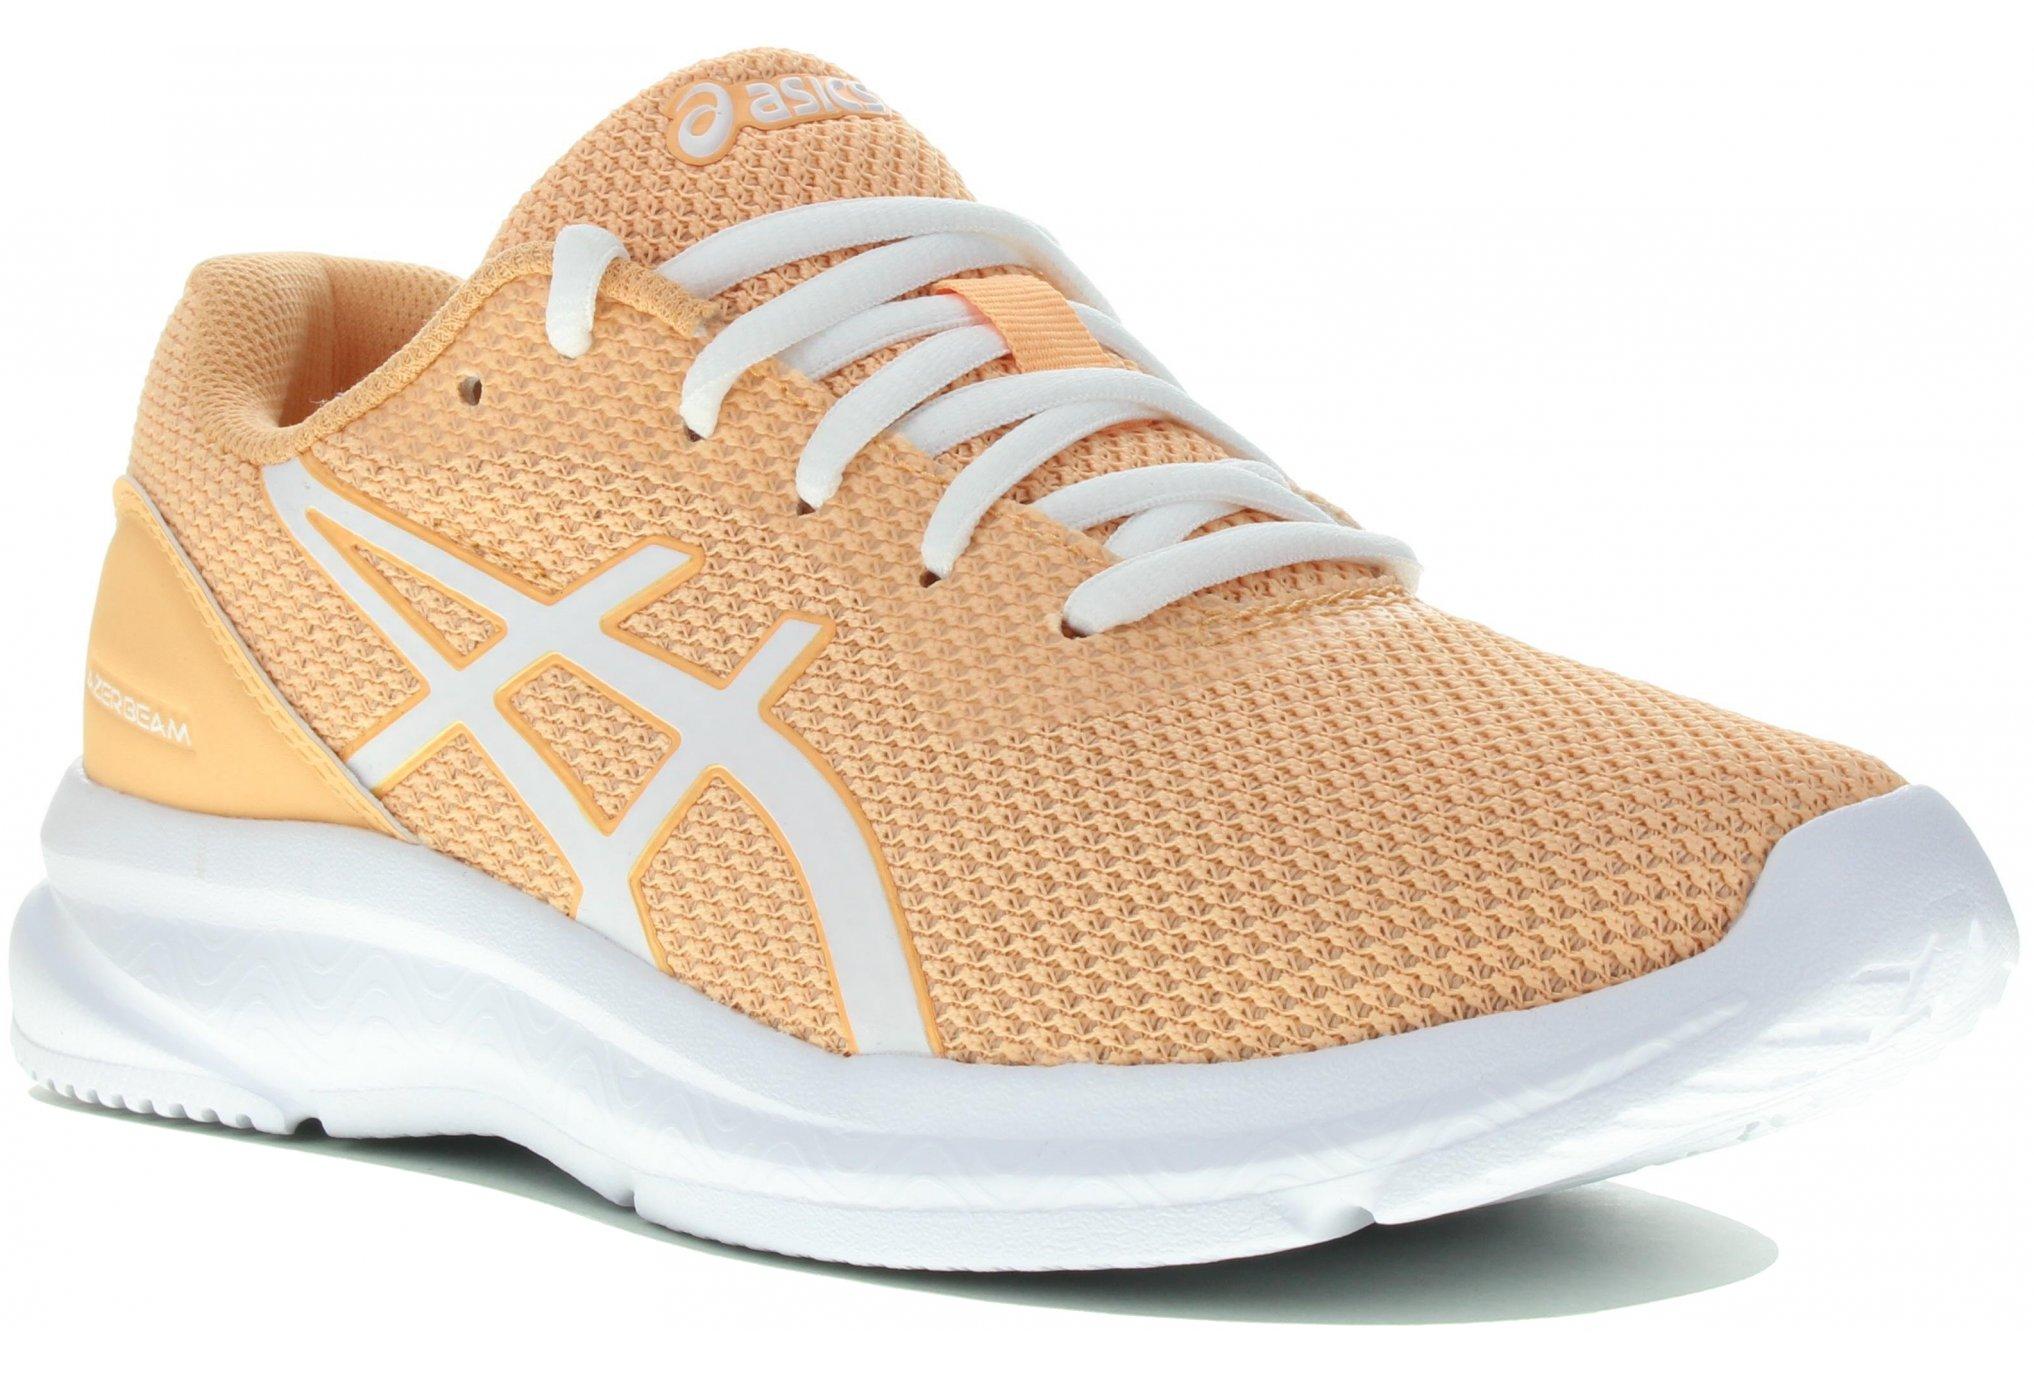 Asics Lazerbeam MB Fille Chaussures running femme